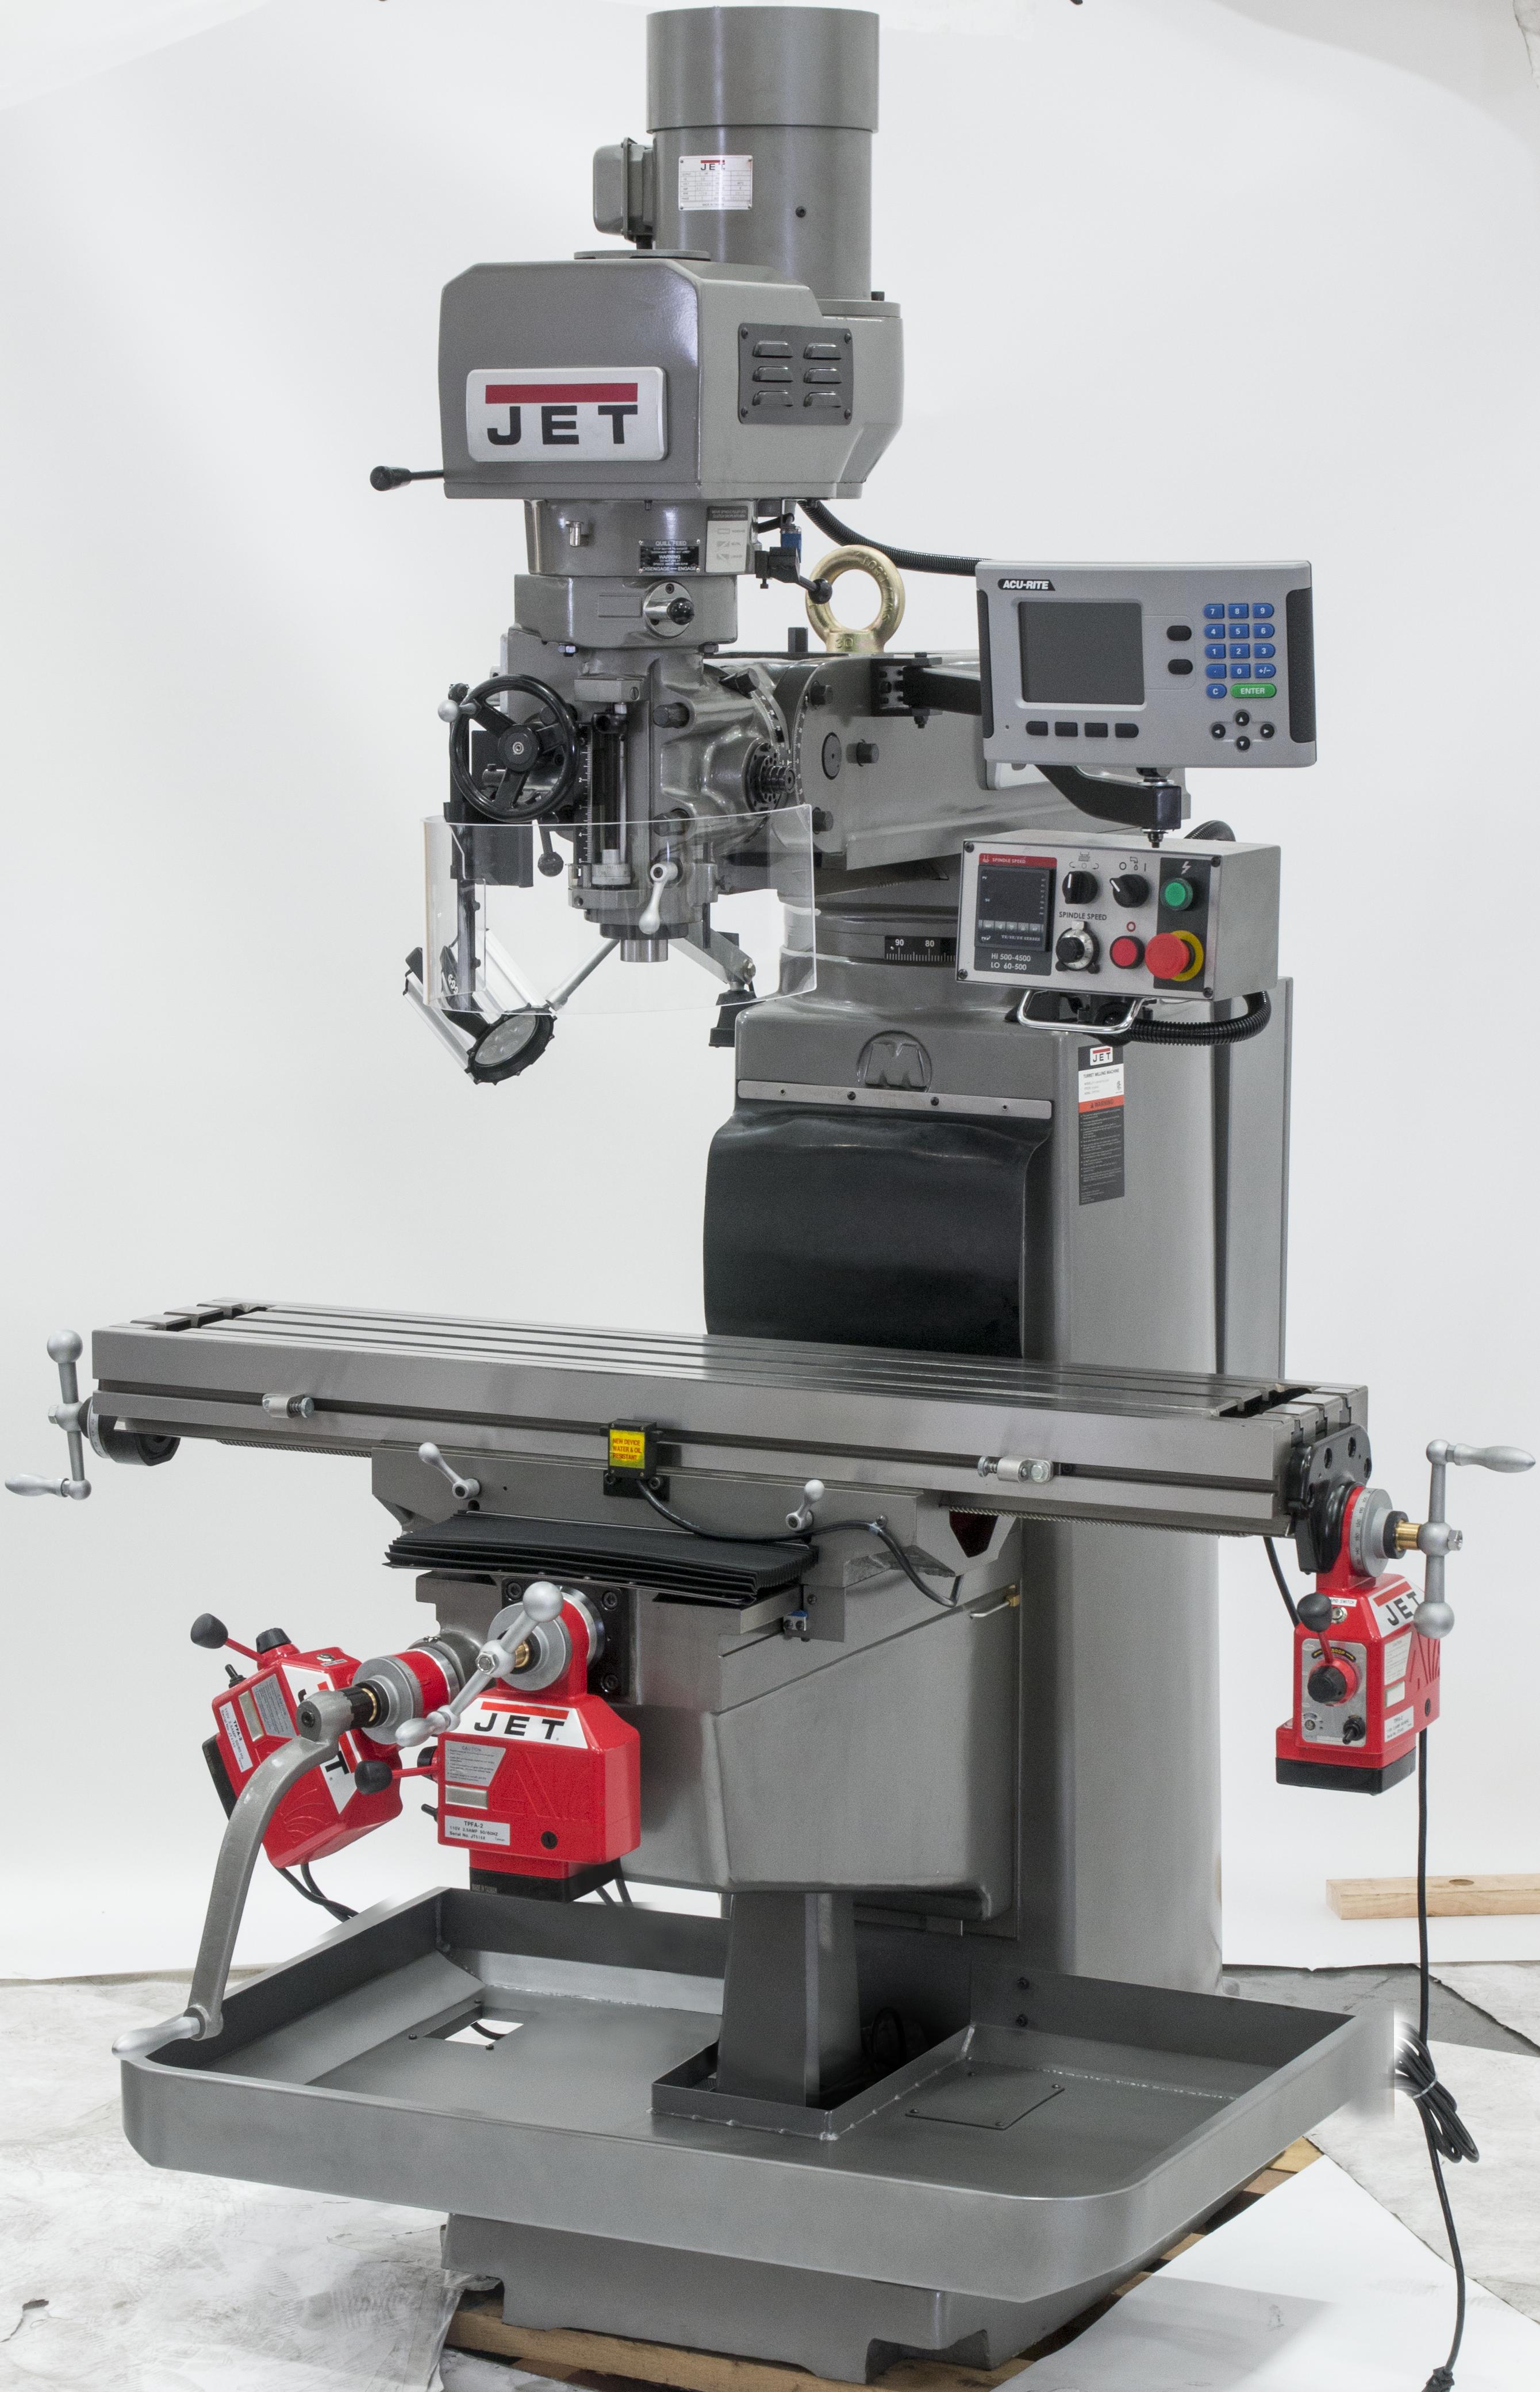 JTM-1050EVS2/230 Electronic Variable Speed Vertical Milling Machine 230V 3Ph